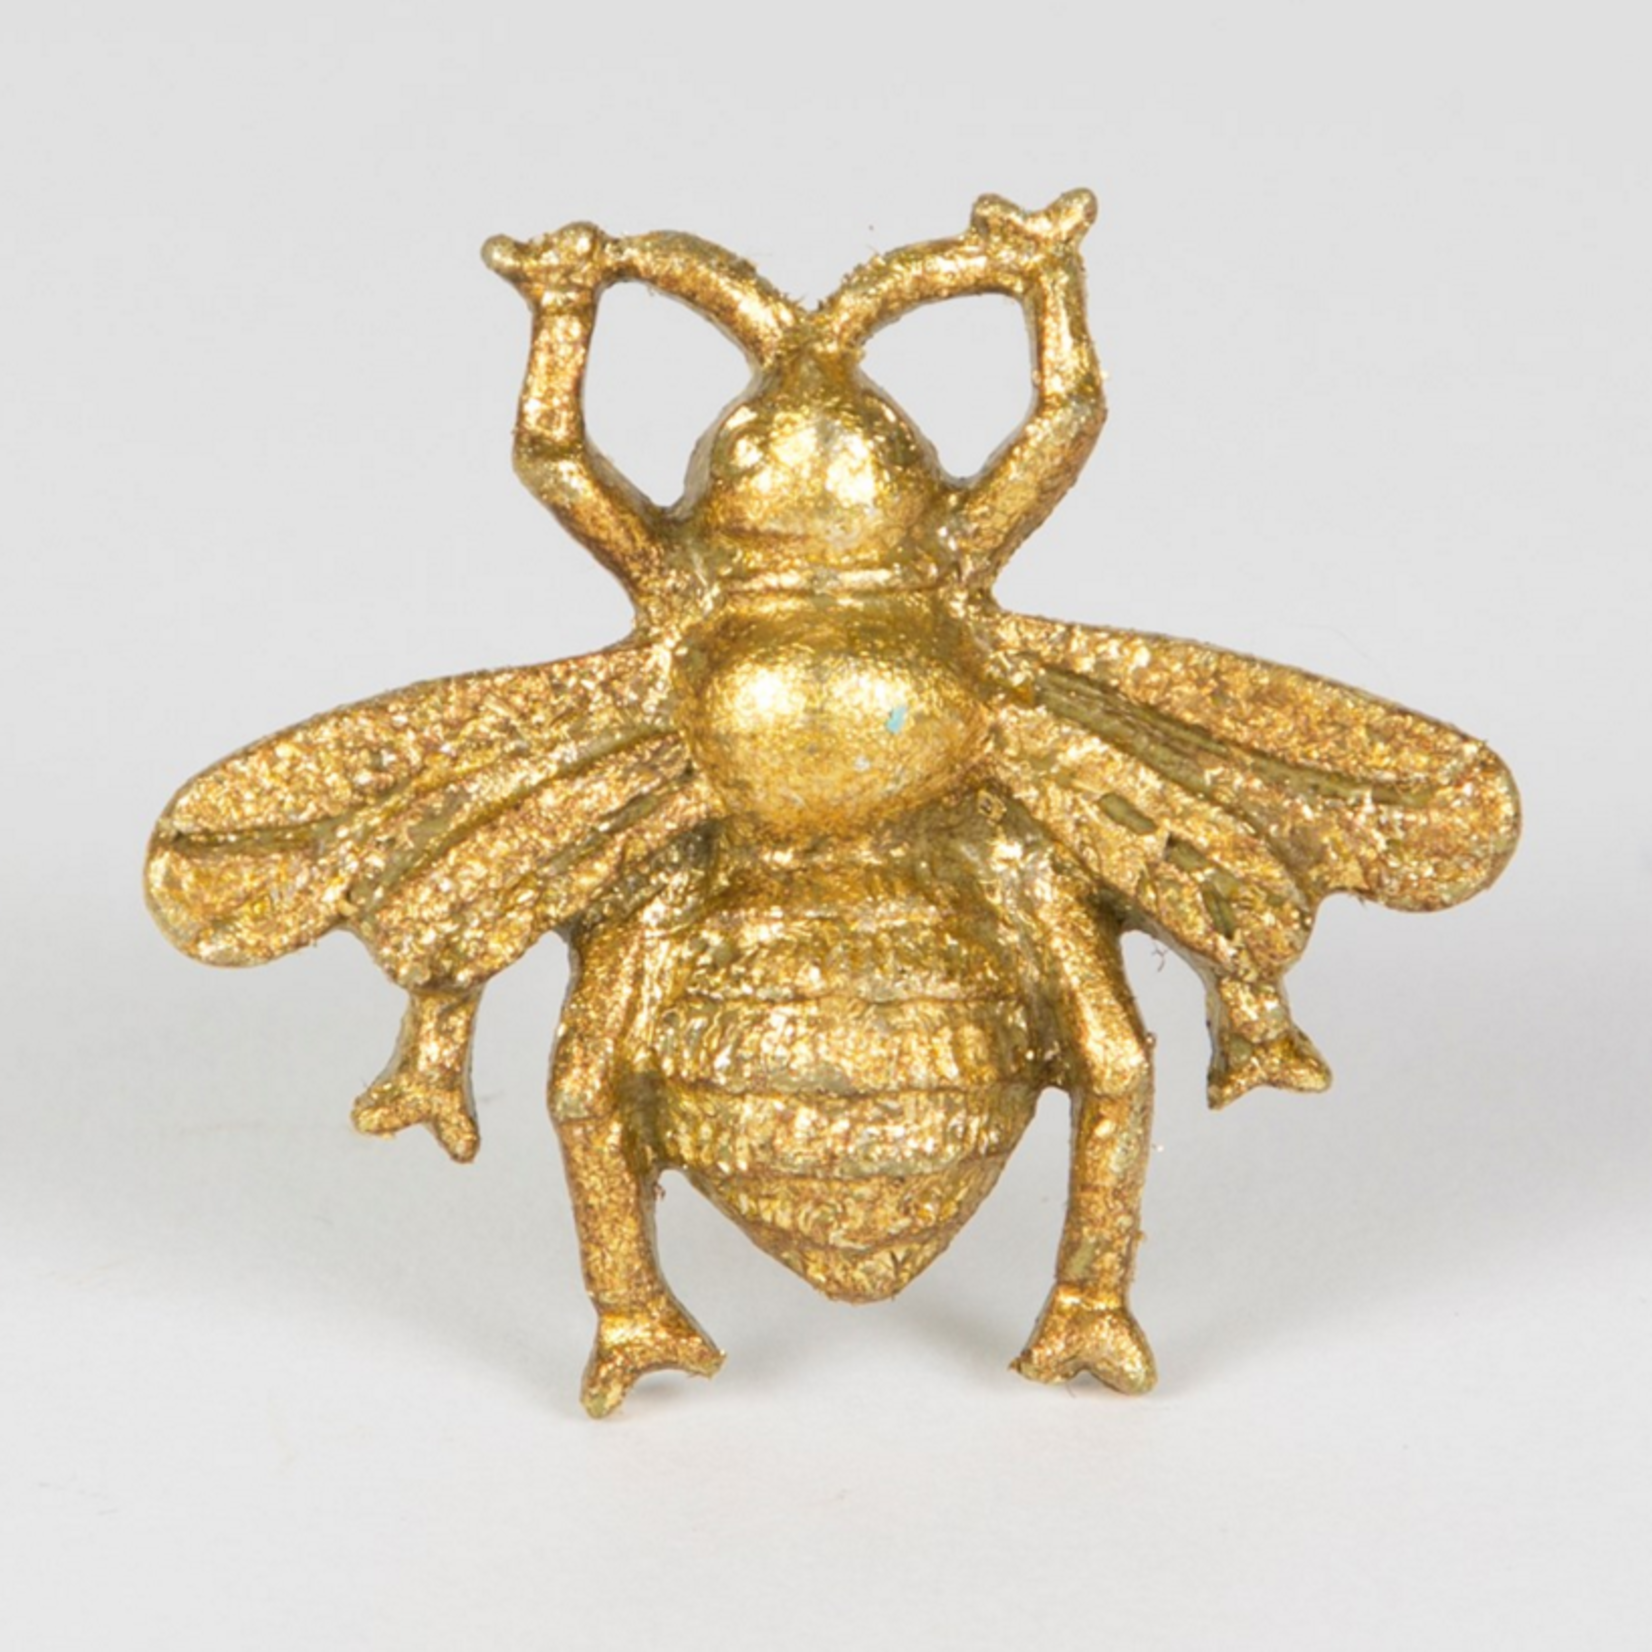 Sass and Belle Golden Bee Vintage Drawer Knob